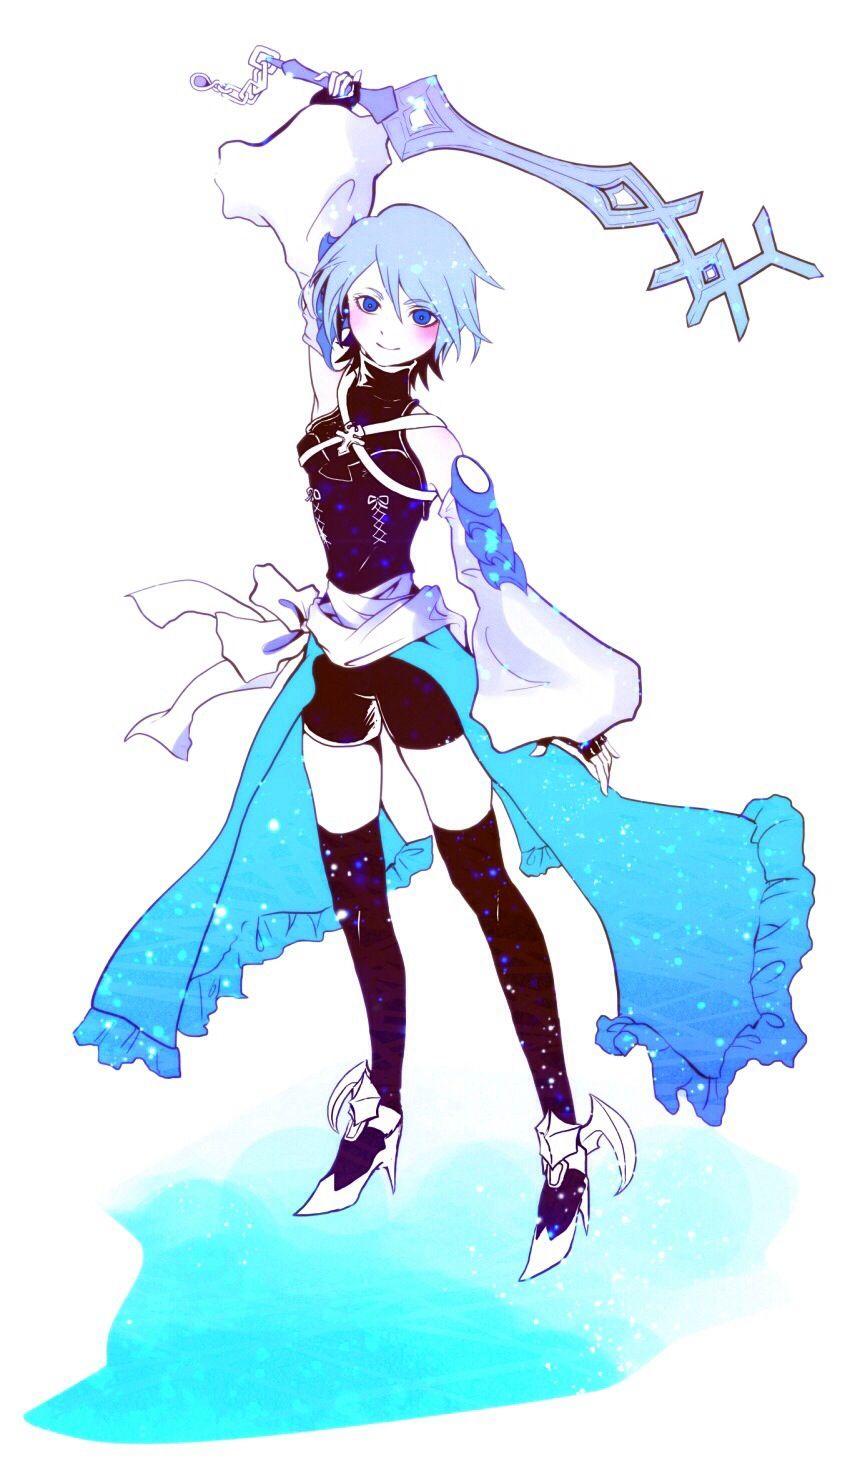 Aqua from Kingdom Hearts. I love her! She's freakin' awesome!!!